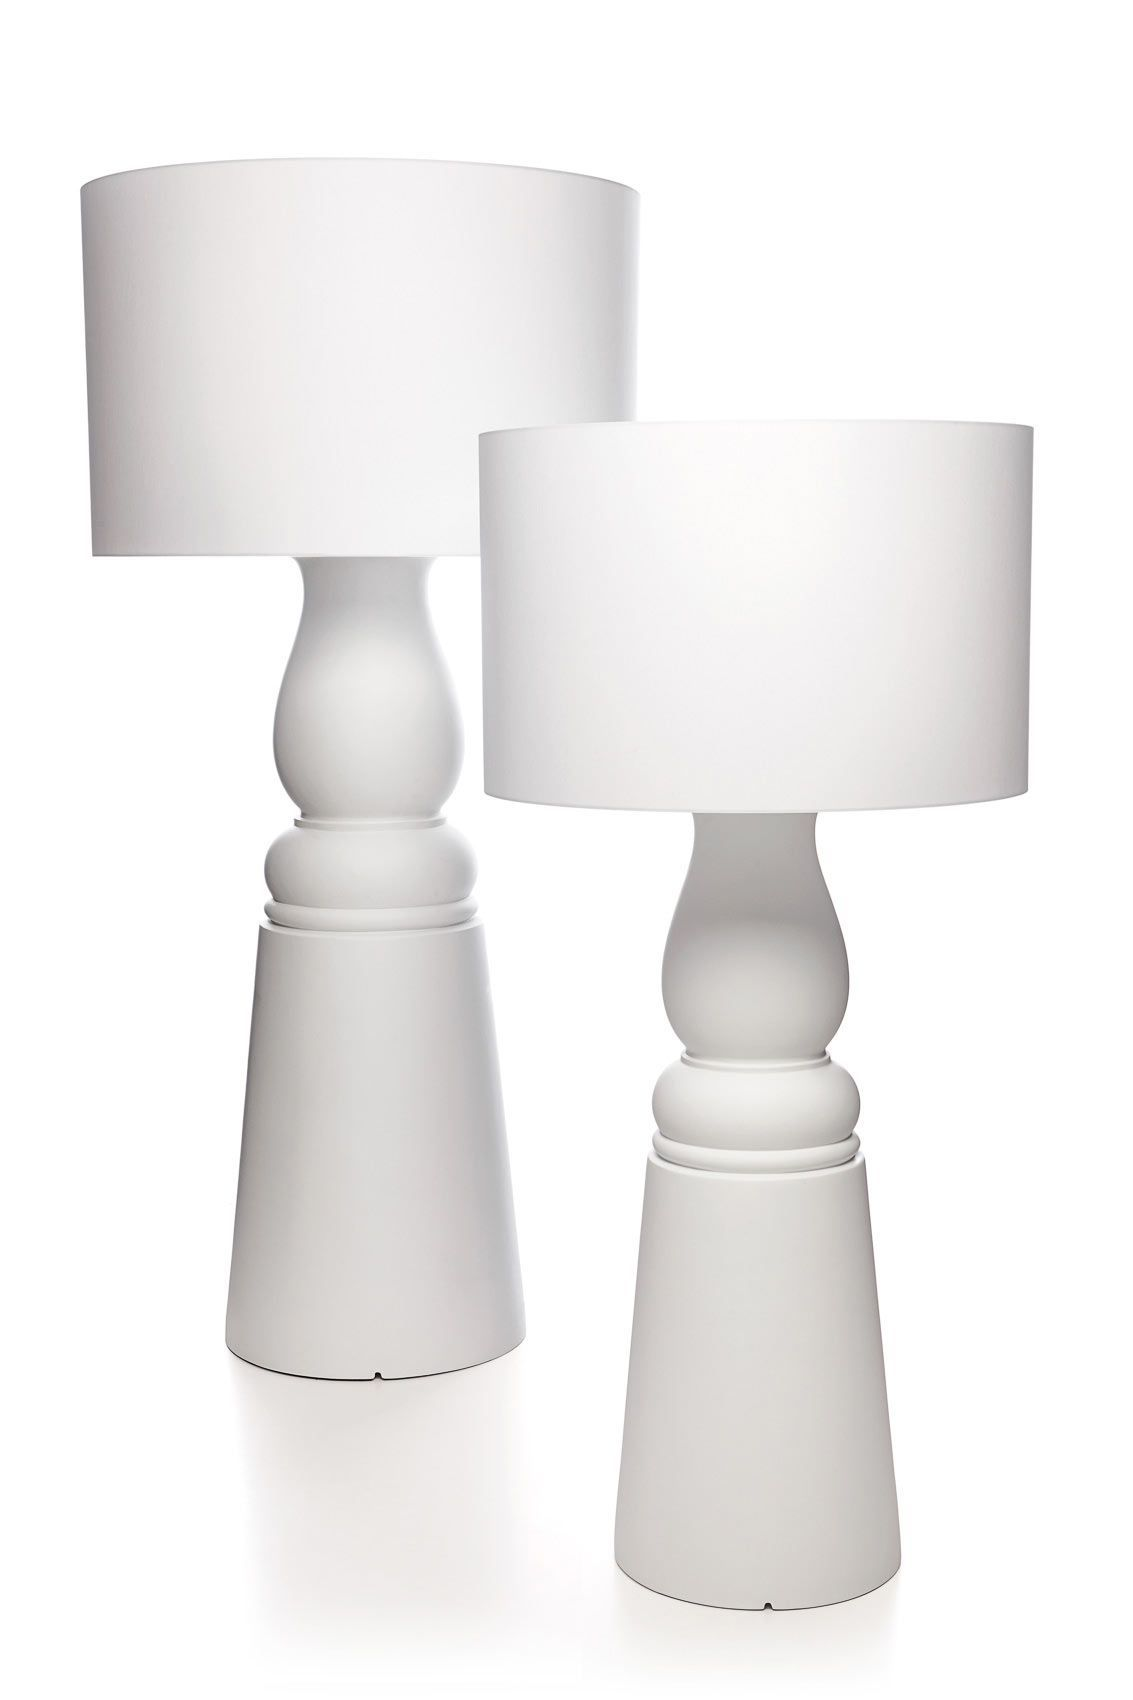 High Quality Moooi U2013 Farooo: Standard Lamps For Floor Lamps For Indoor Lighting, Light  Source Exclusive